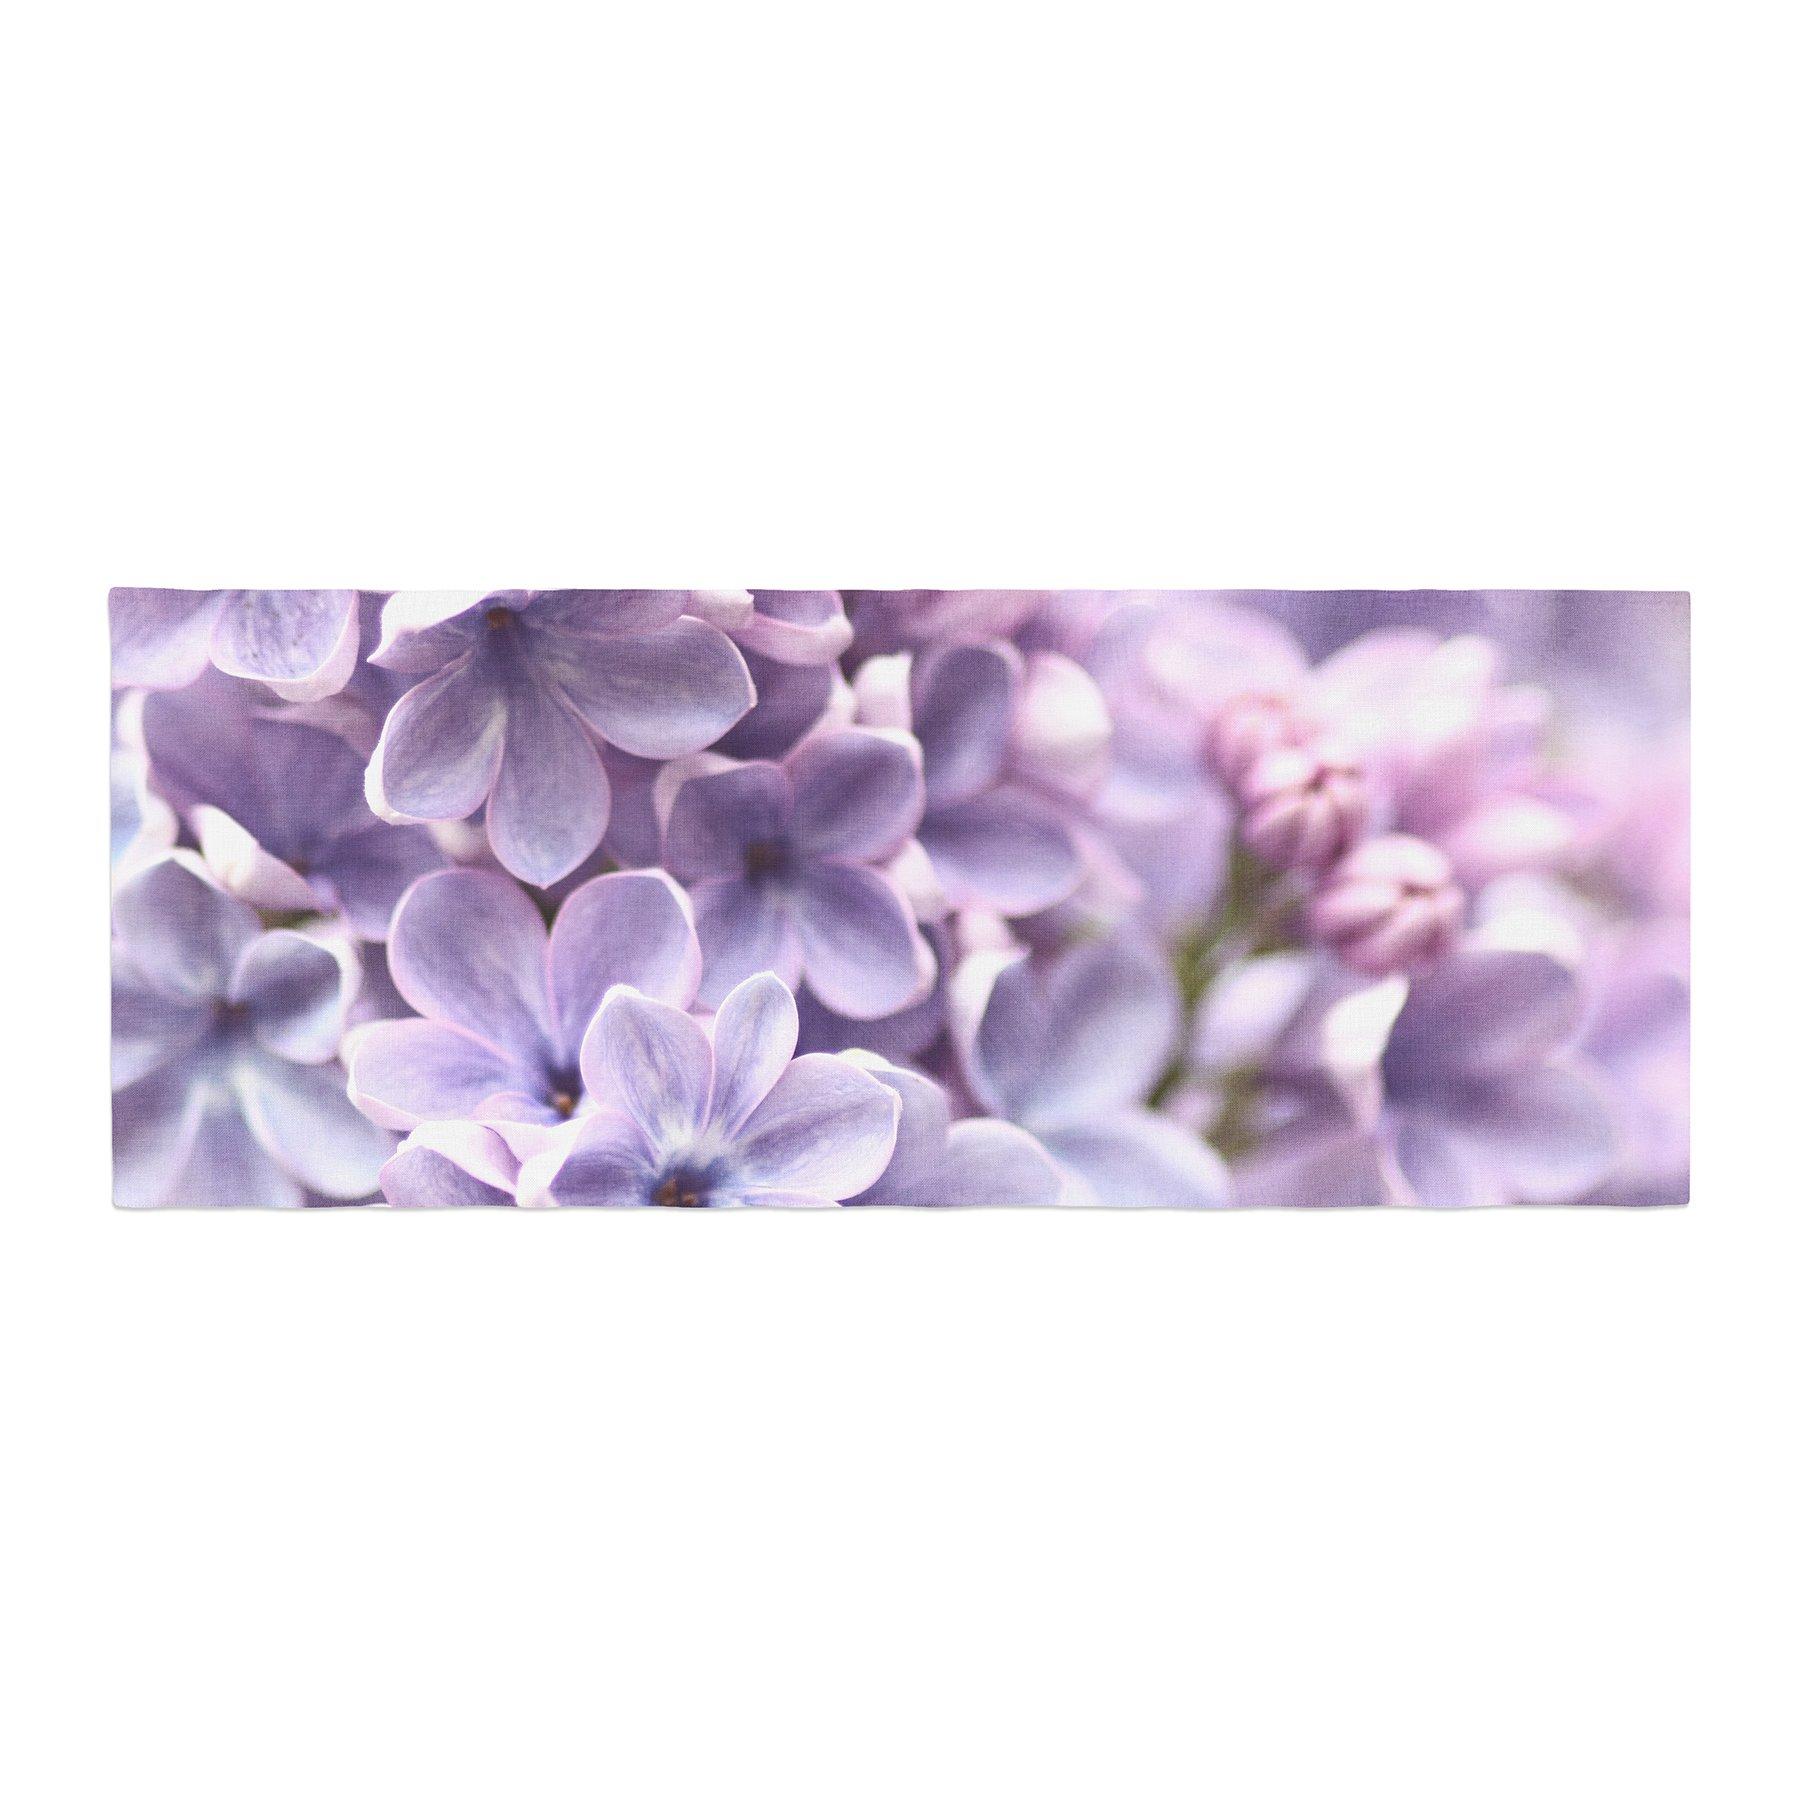 Kess InHouse Sylvia Cook Lilac Purple Flowers Bed Runner, 34'' x 86''